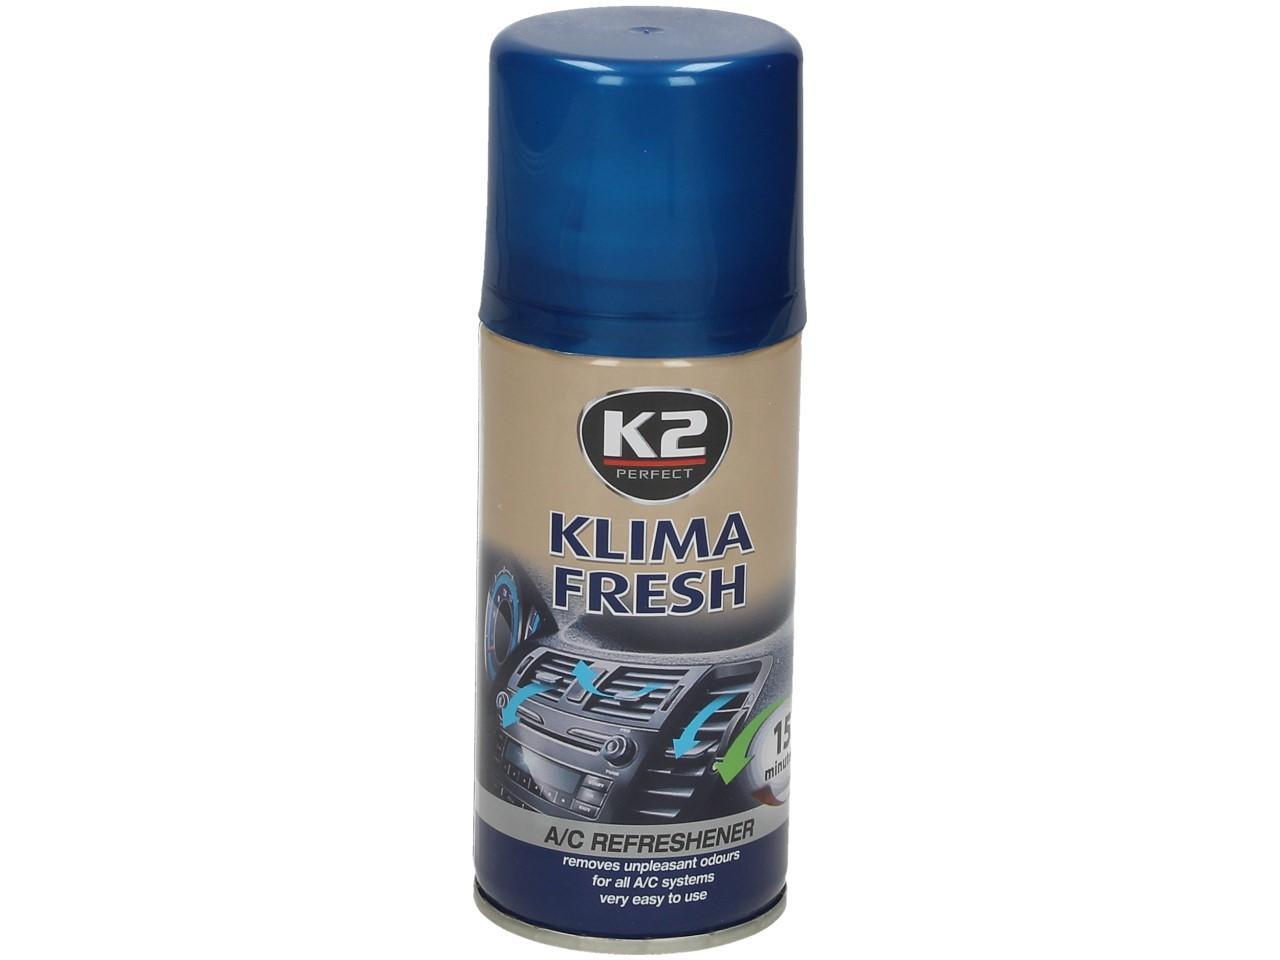 Foto 5 - K2 KLIMA FRESH 150 ml - osvěžovač interiéru